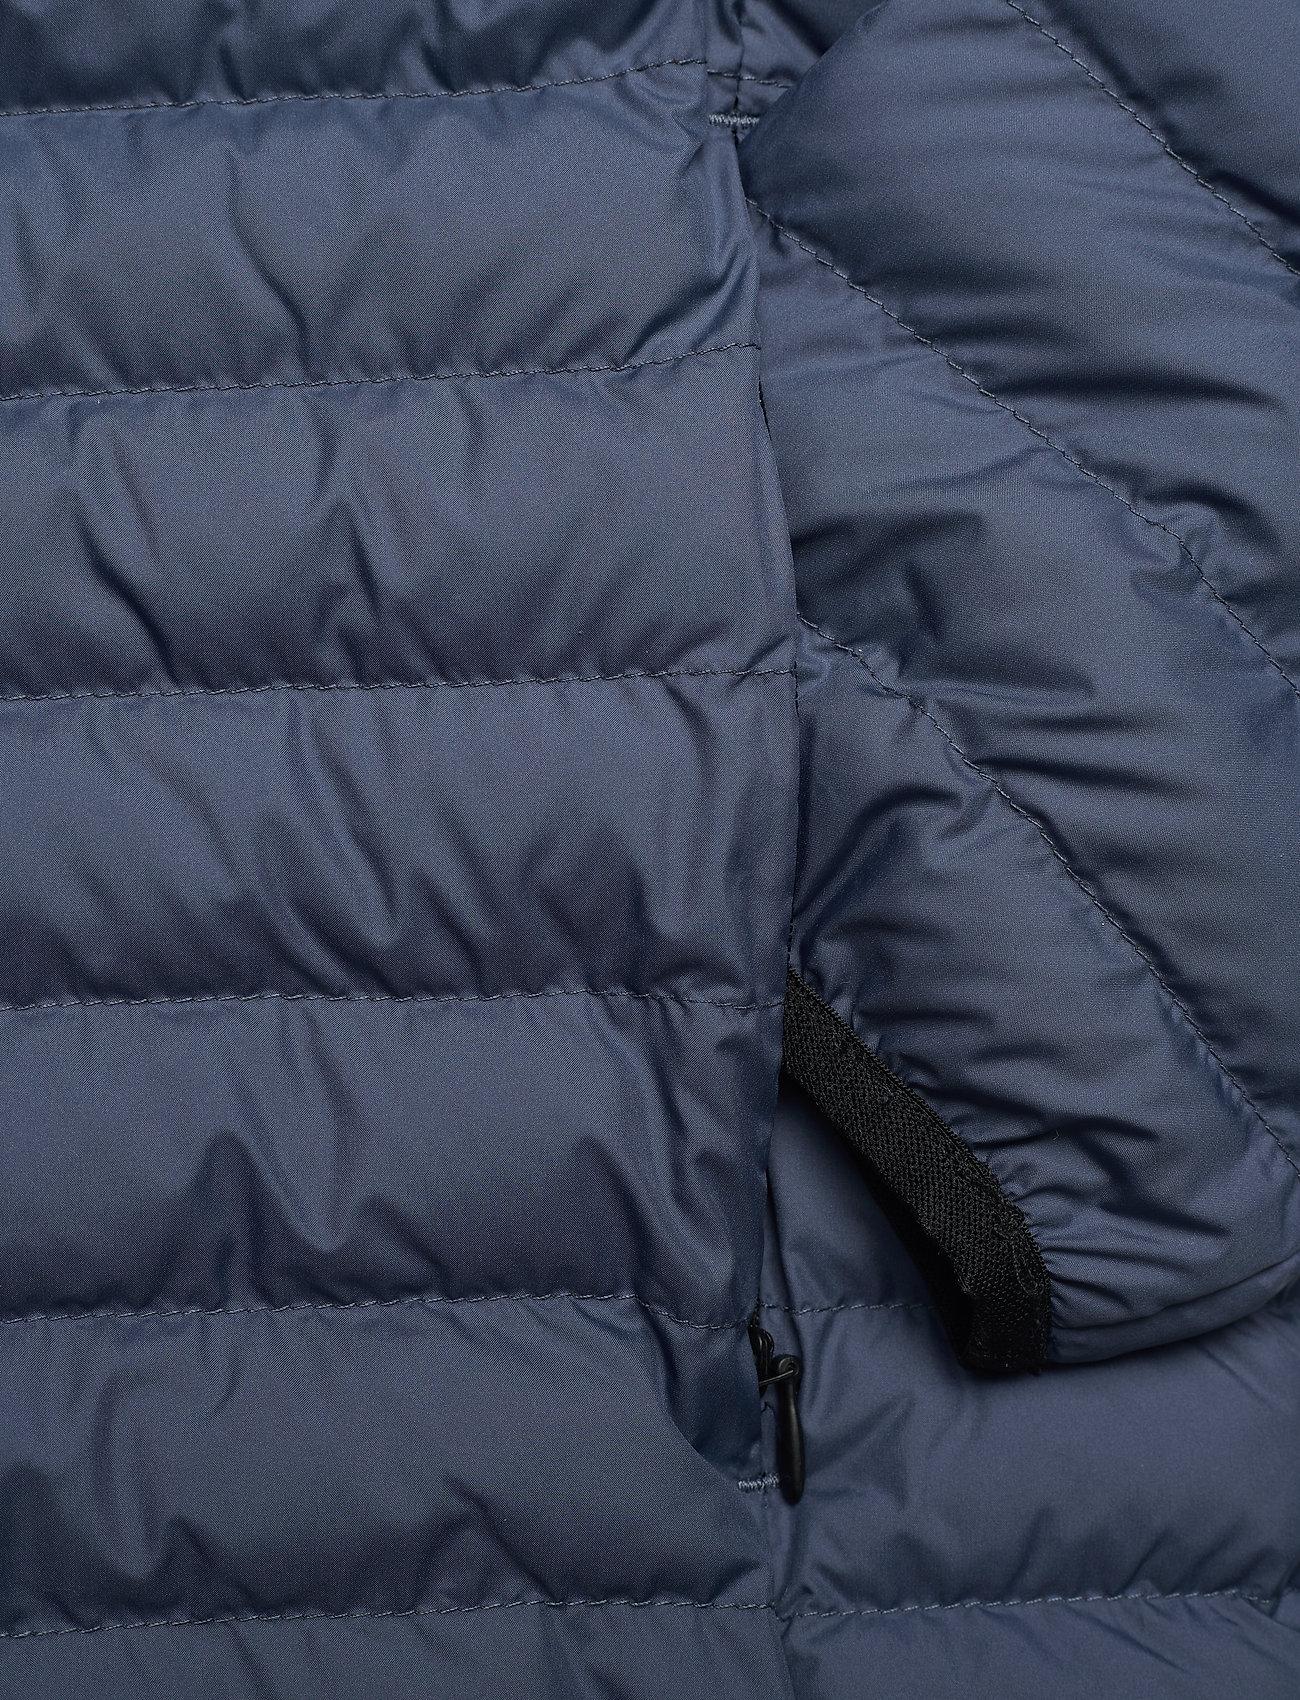 ECOALF - ATLANTIC JACKET MAN - kurtki puchowe - grey blue - 4